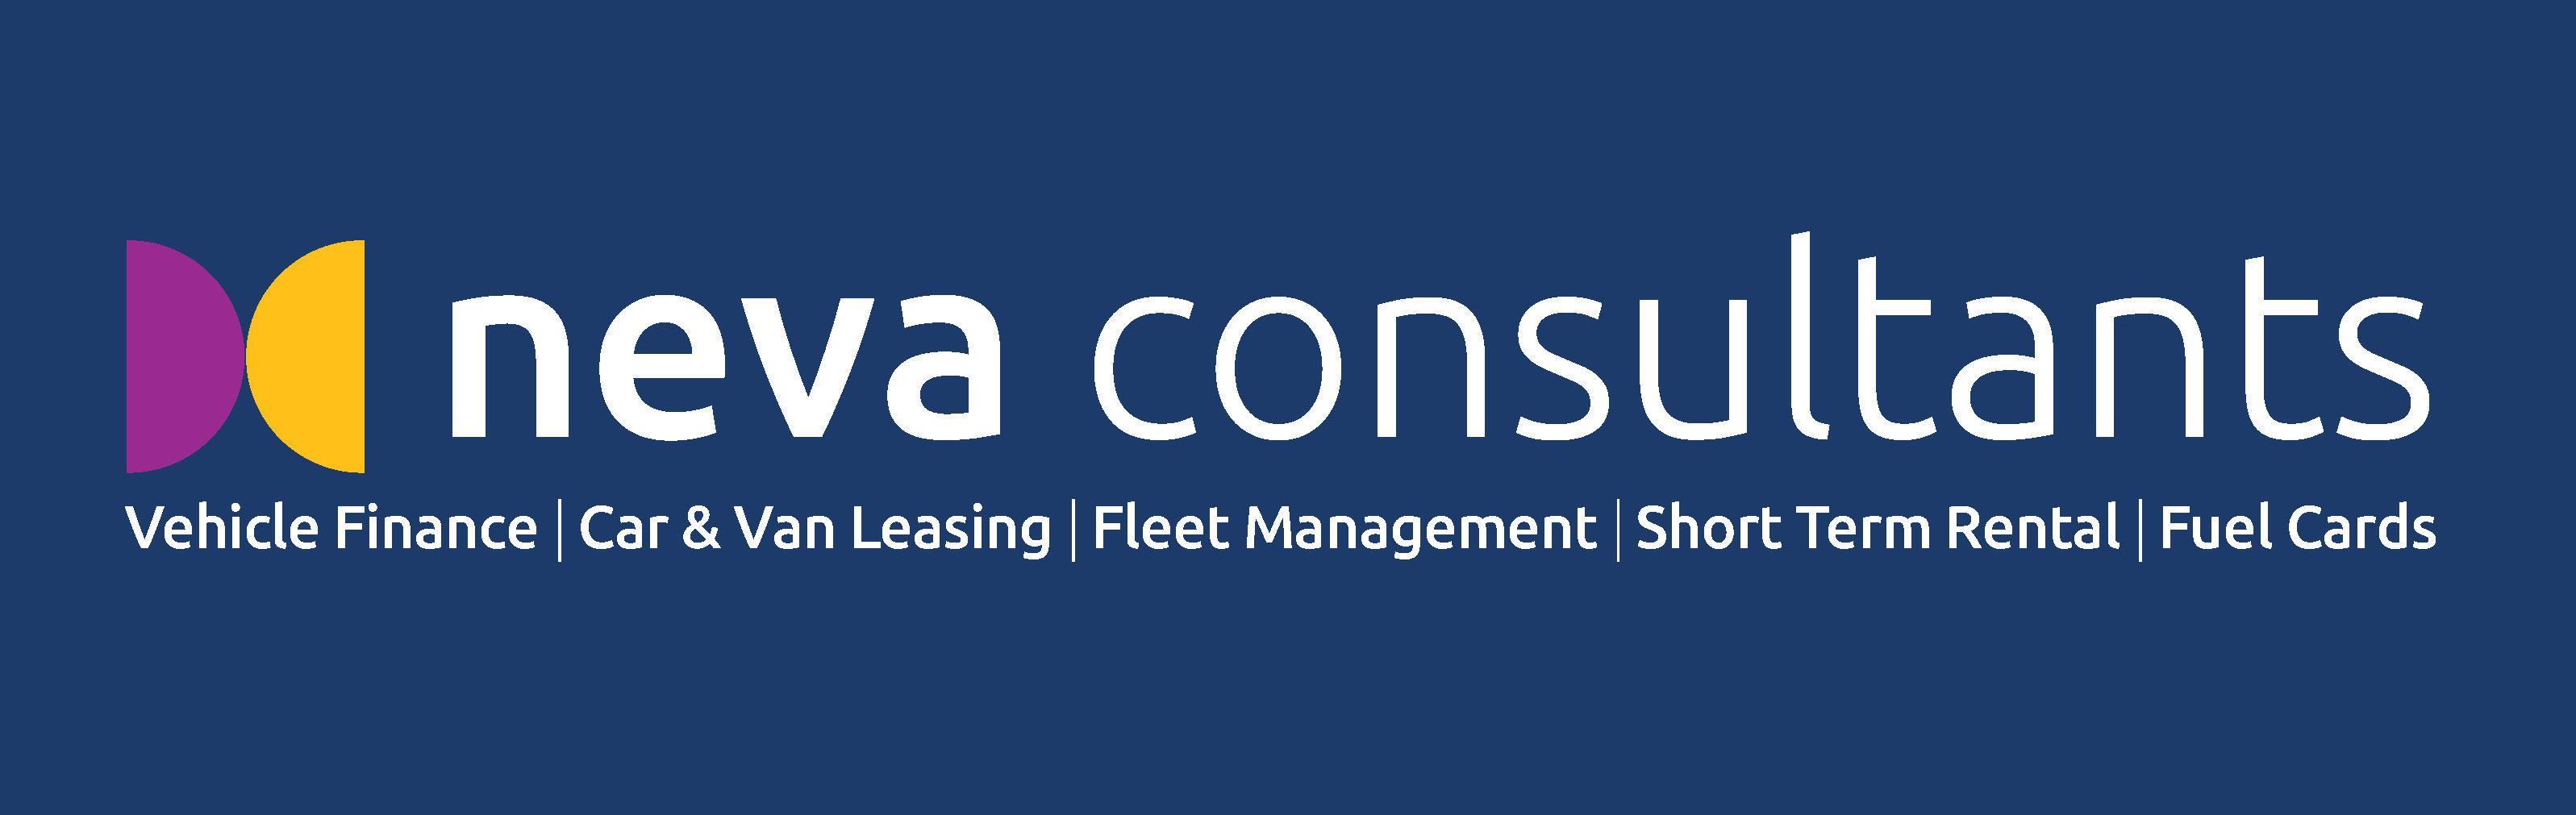 neva-consultants-logo